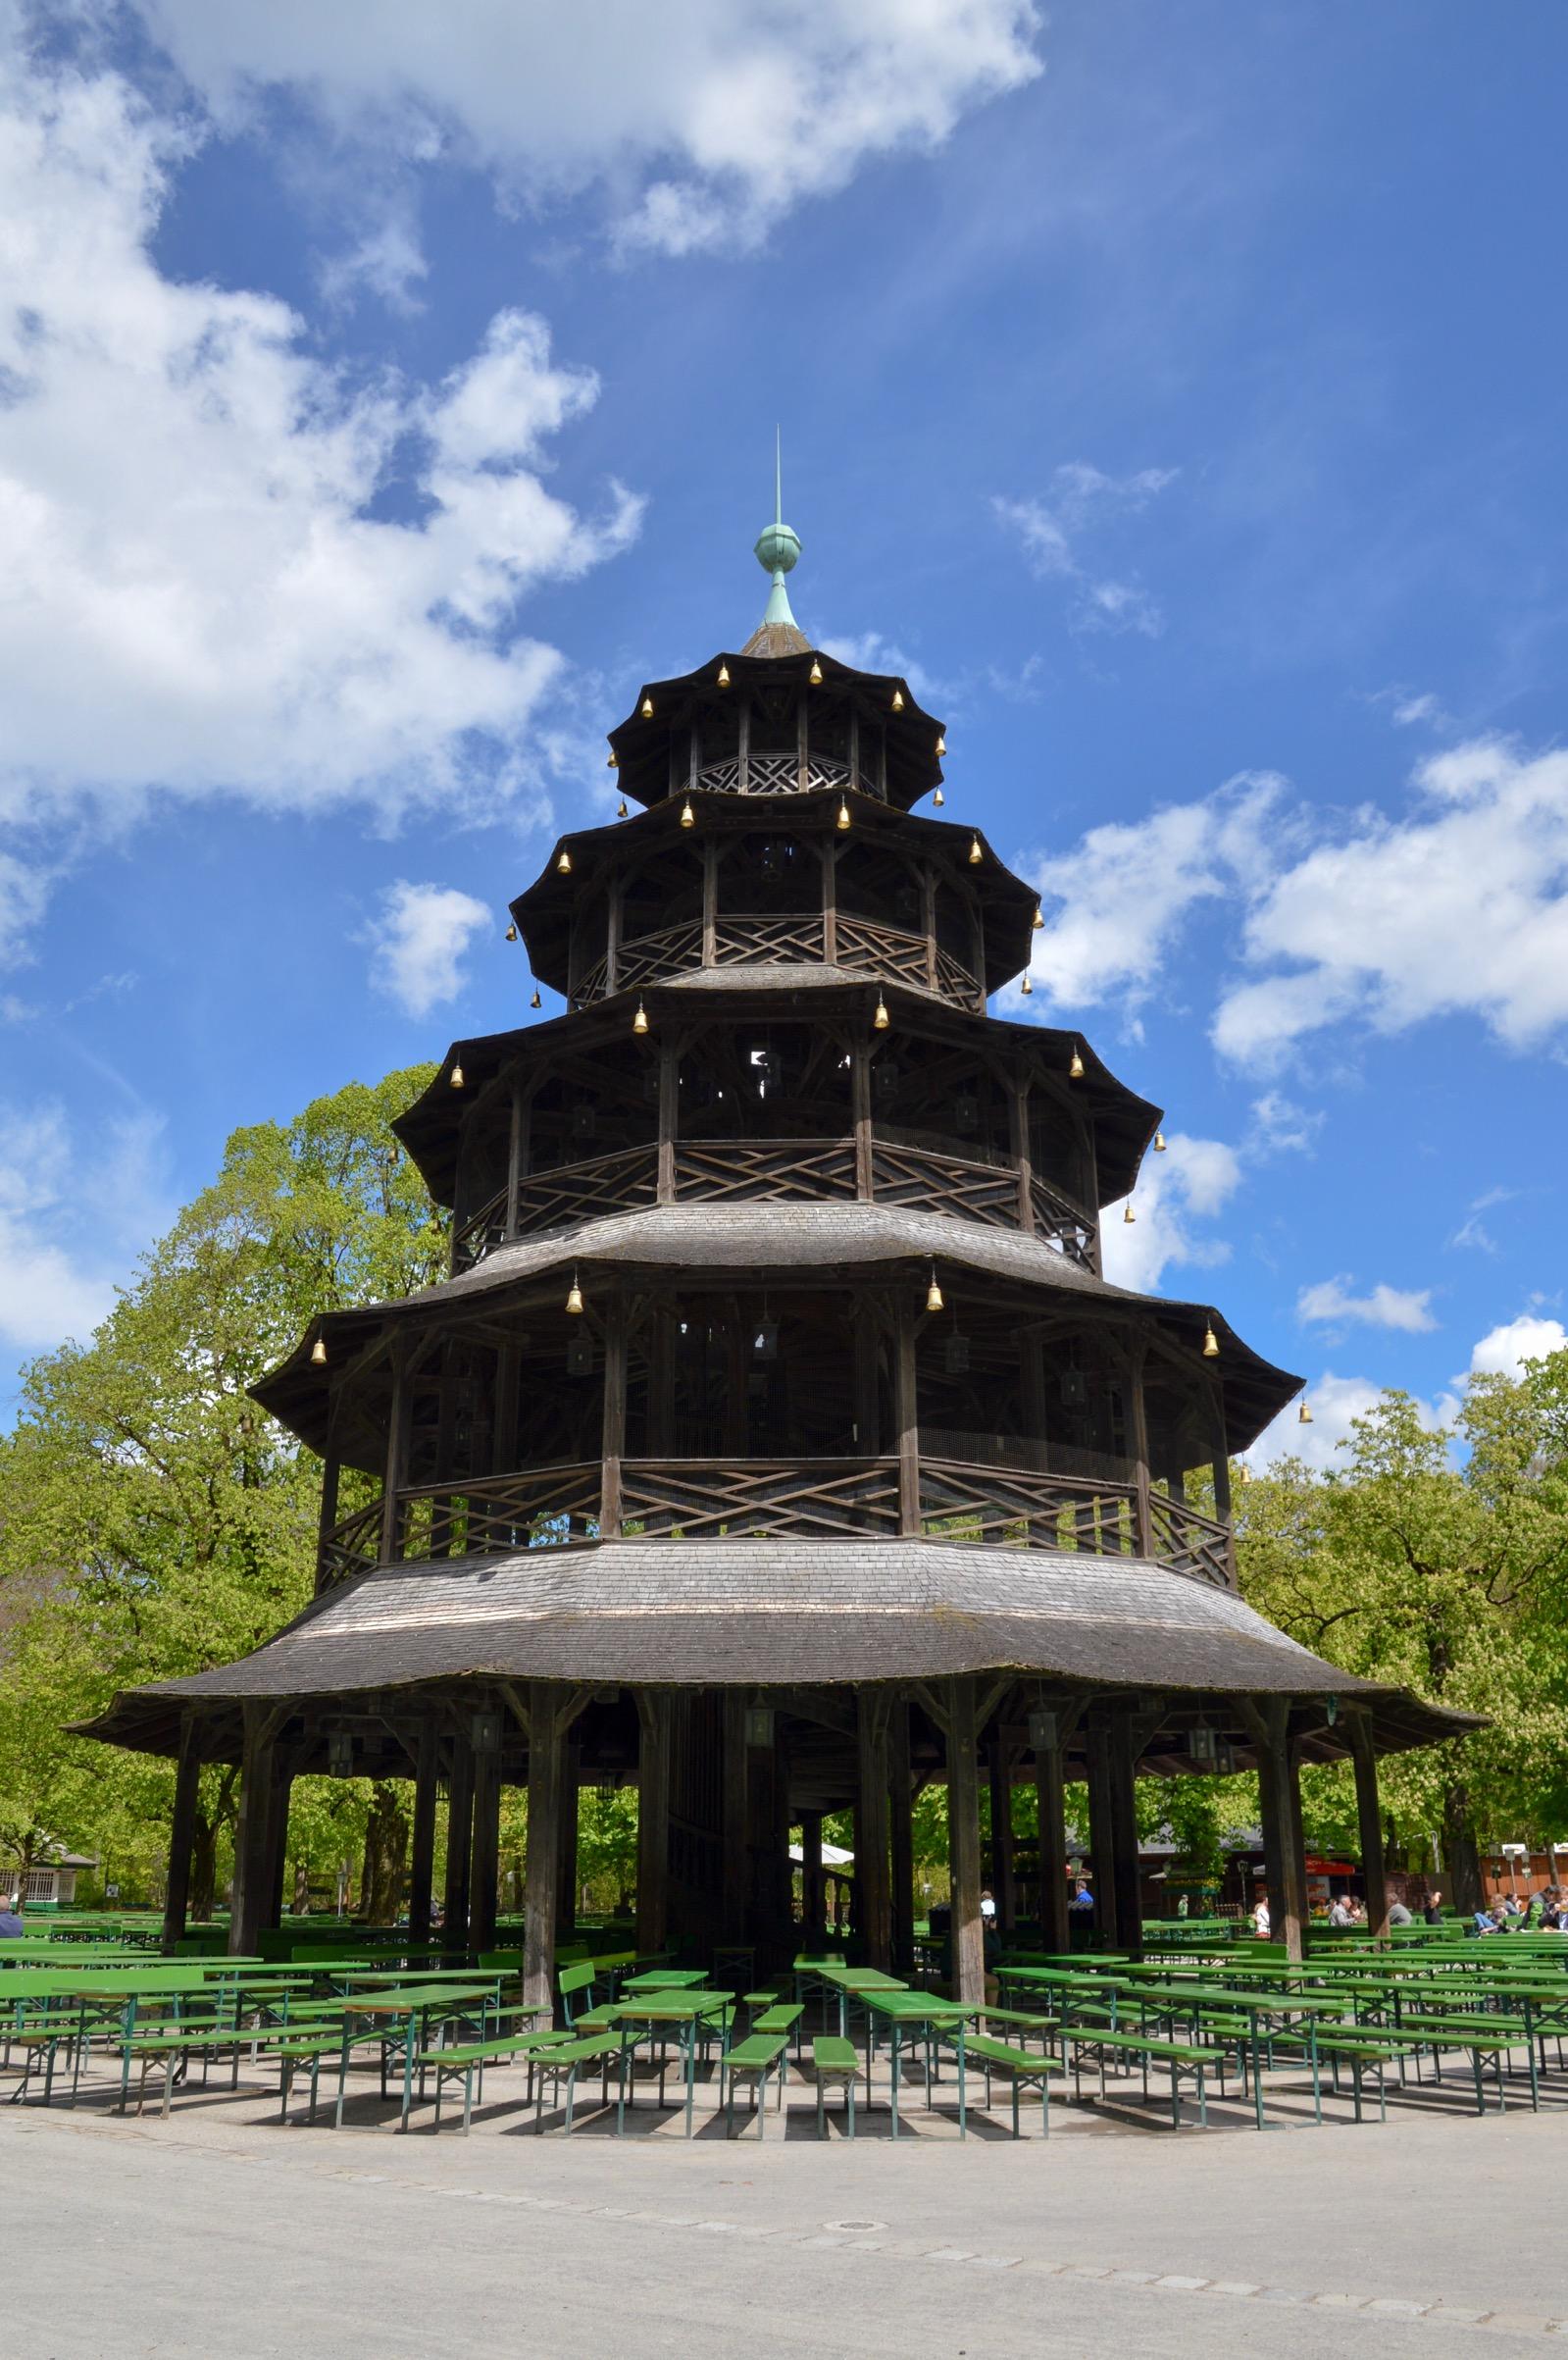 Chinesischer Turm, Munich, Germany